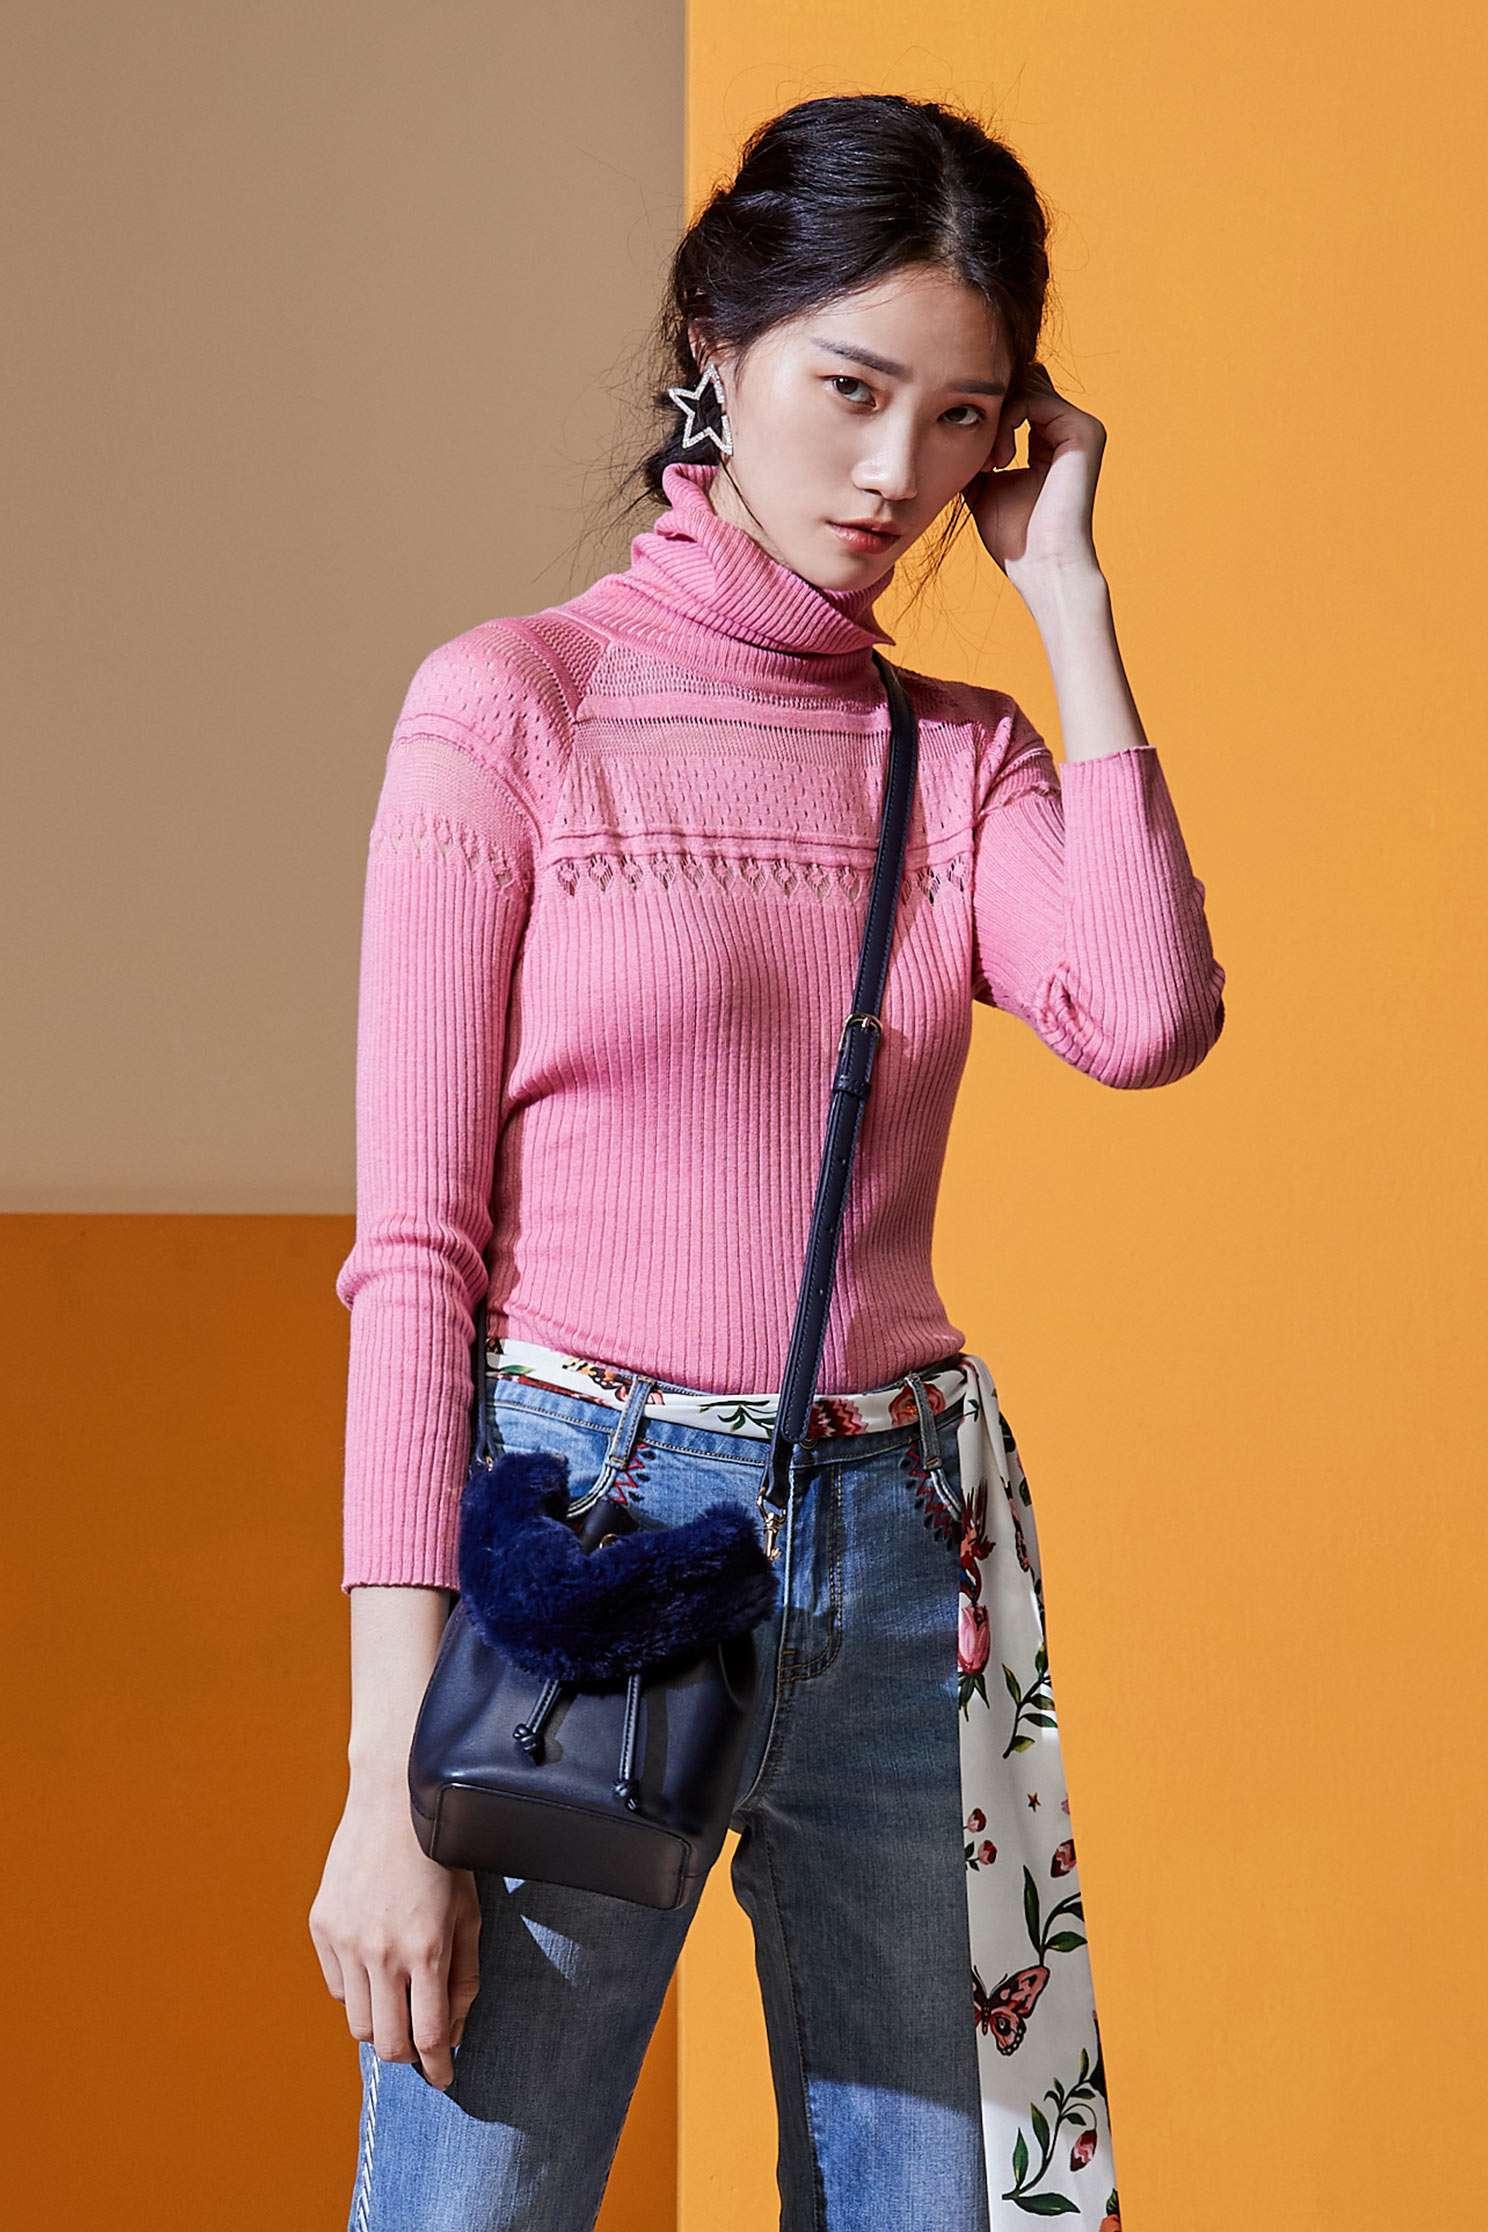 Smoked pink geometry hollow knitwear,top,croptop,knitting,knittedtop,knittedtop